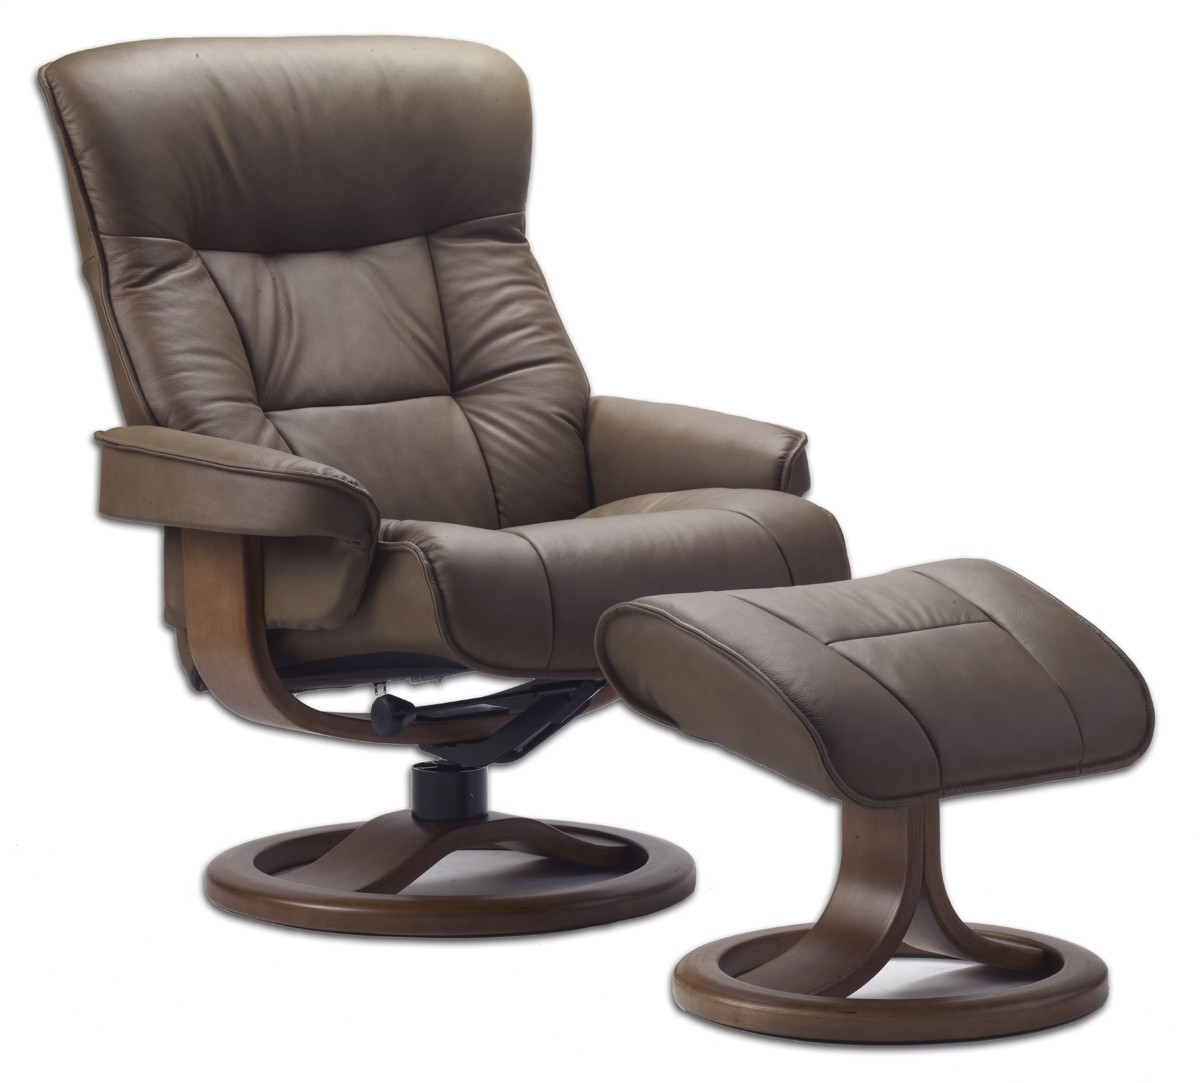 Fjords 855 Loen Large Leather Recliner Norwegian Ergonomic Scandinavian  Lounge Reclining Chair Furniture Nordic Line Genuine